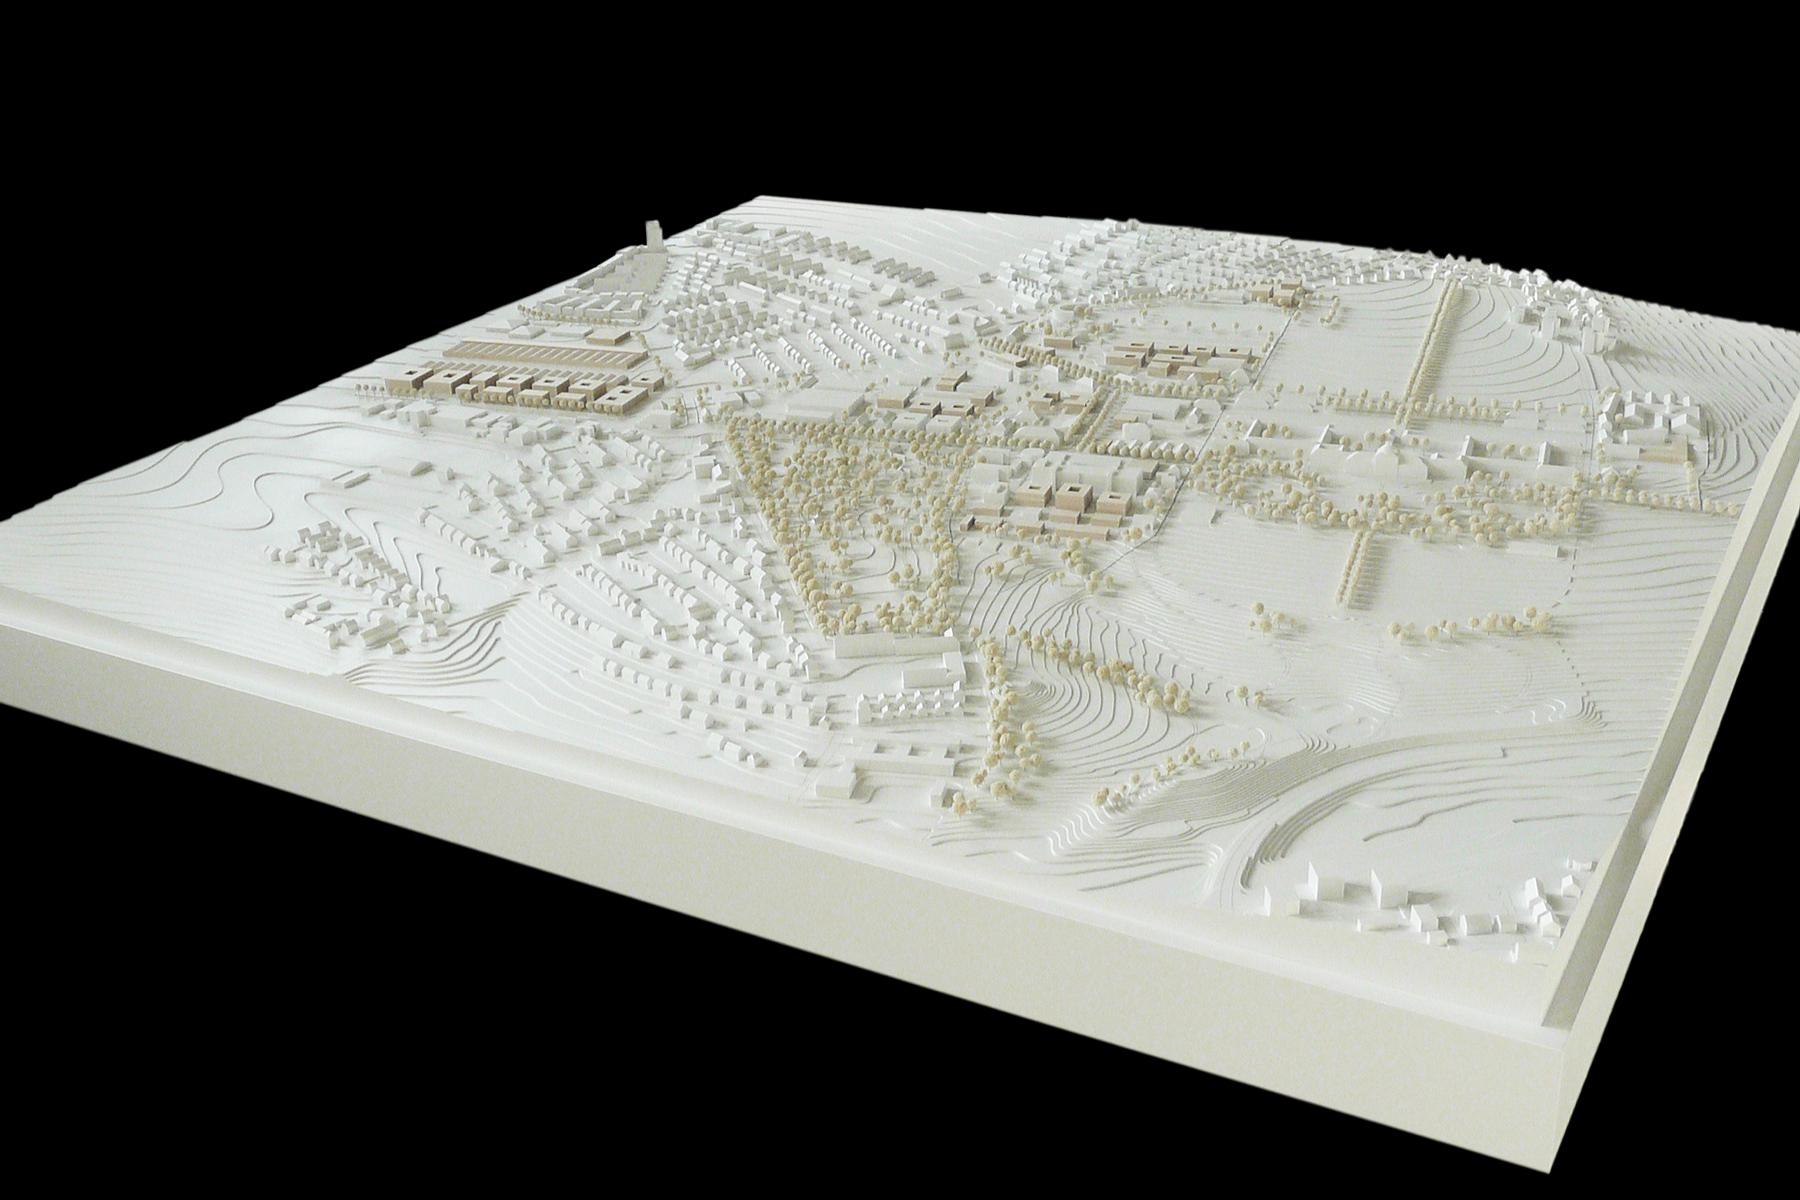 architekturmodell campus universit t hohenheim b la. Black Bedroom Furniture Sets. Home Design Ideas